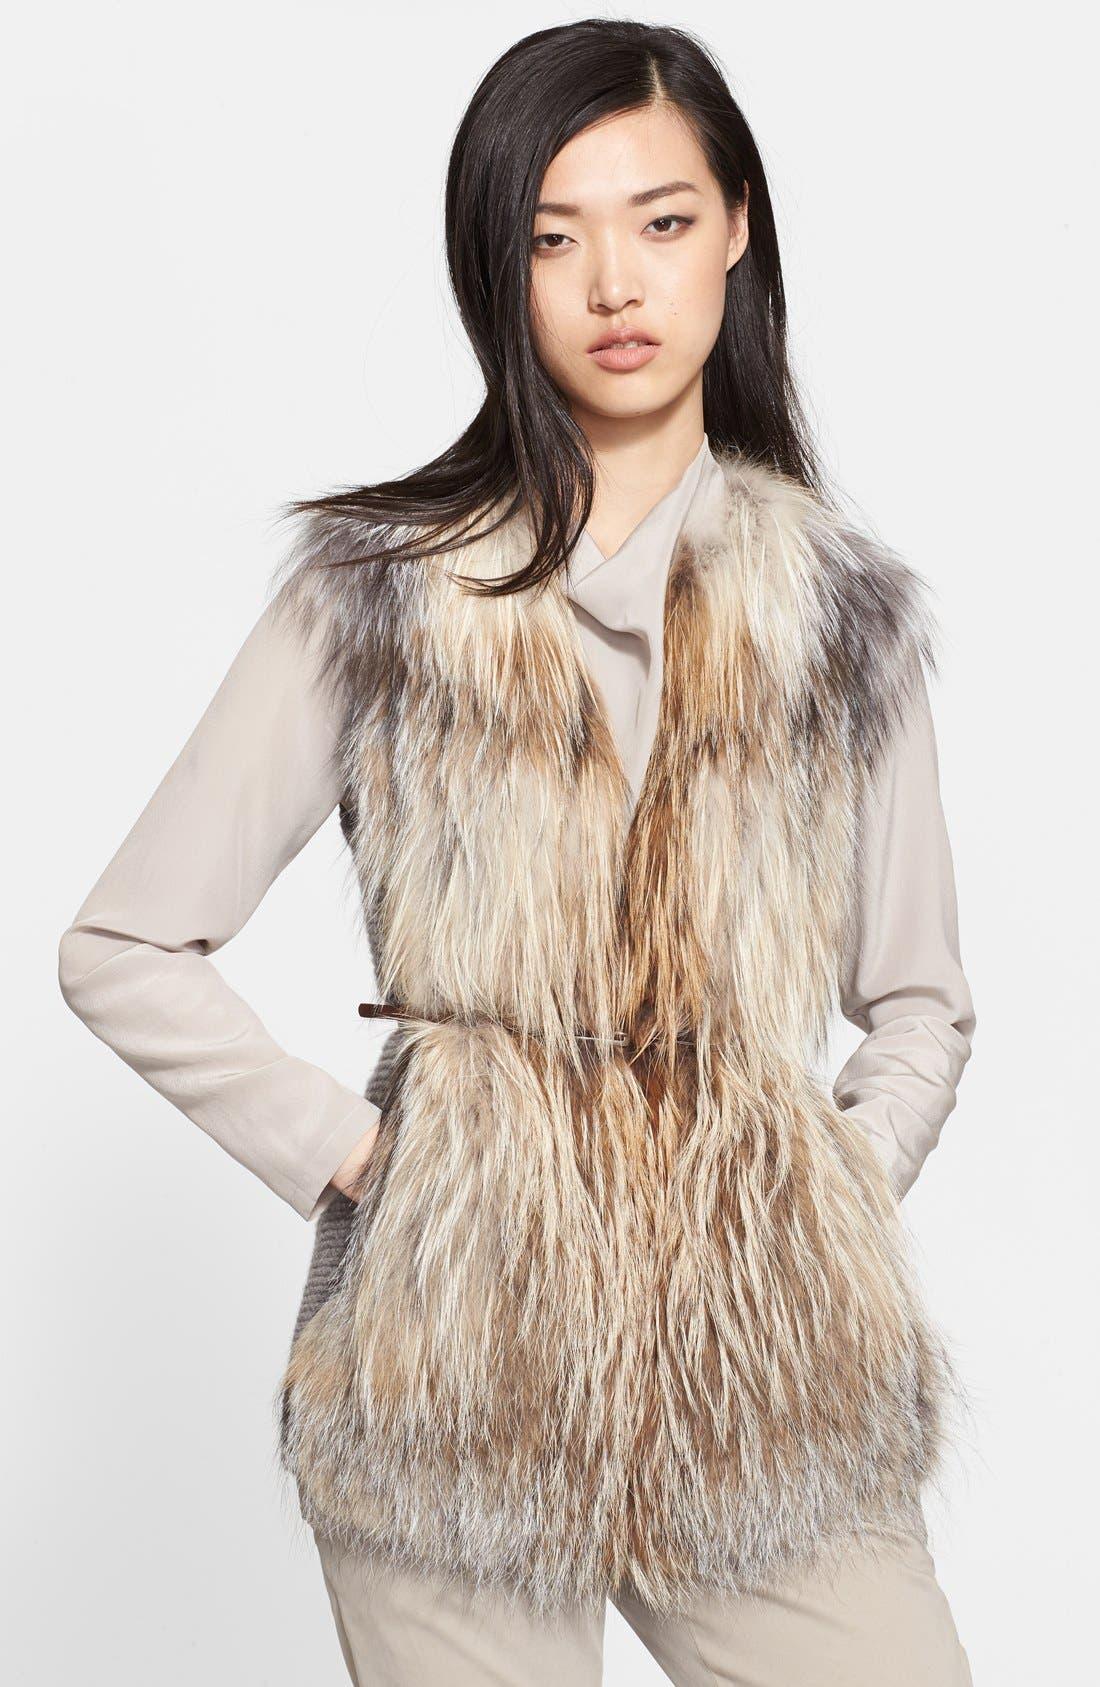 Alternate Image 1 Selected - Fabiana Filippi Genuine Fox Fur Sweater Vest with Leather Belt